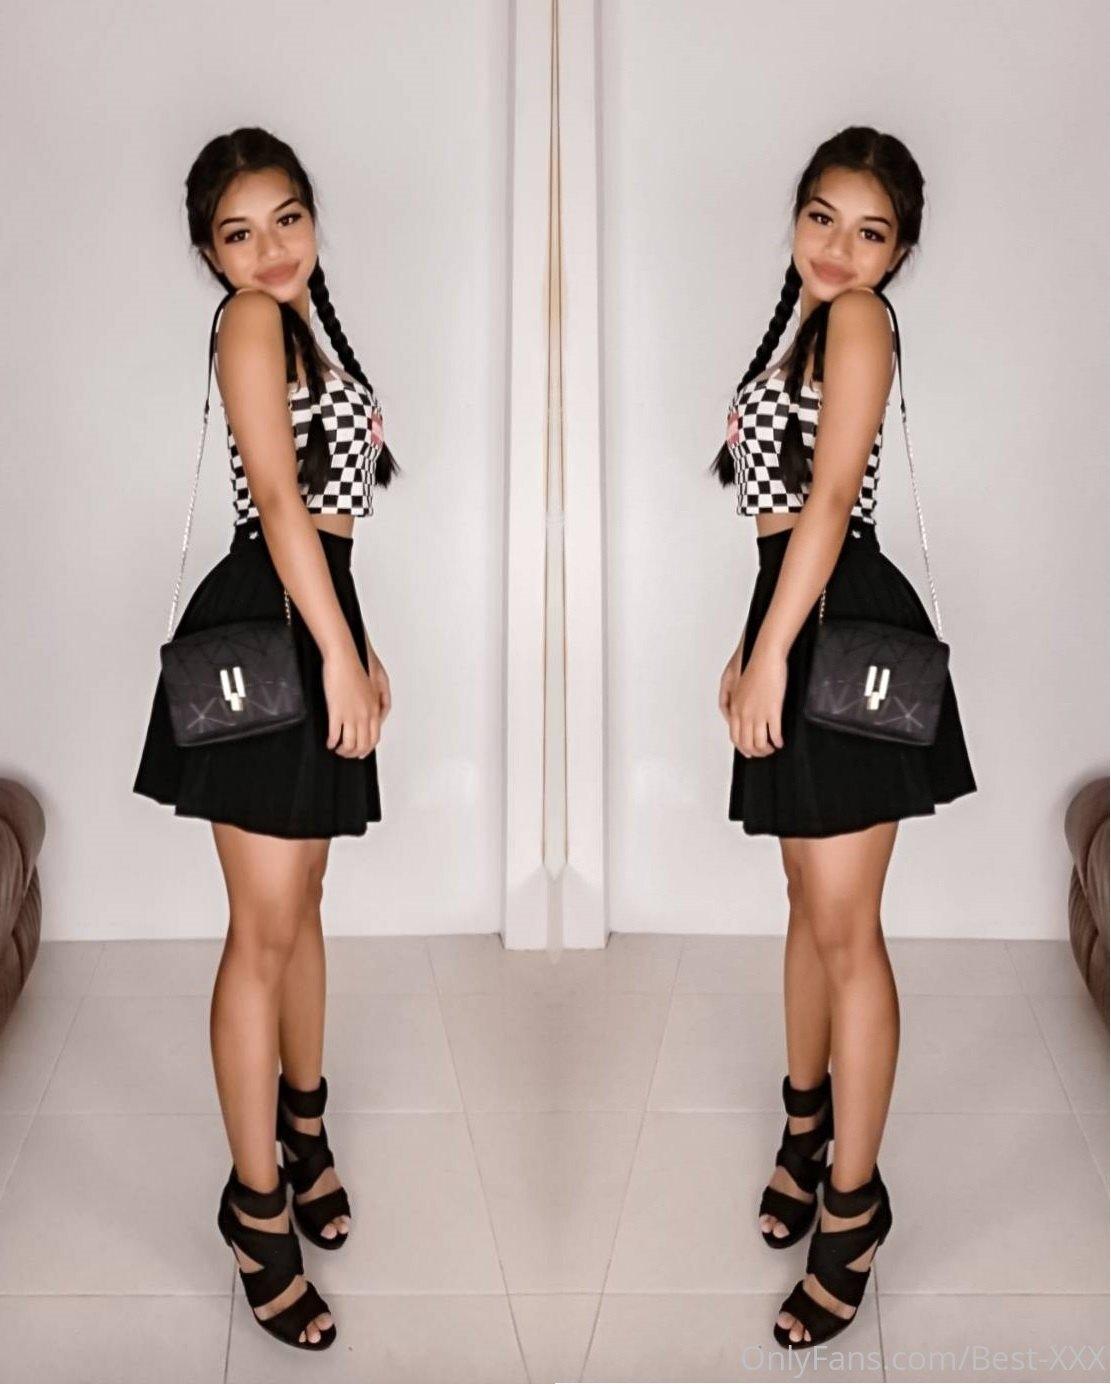 Mo Thai Pattaya Girl Leaked Onlyfans Best Xxx 0060